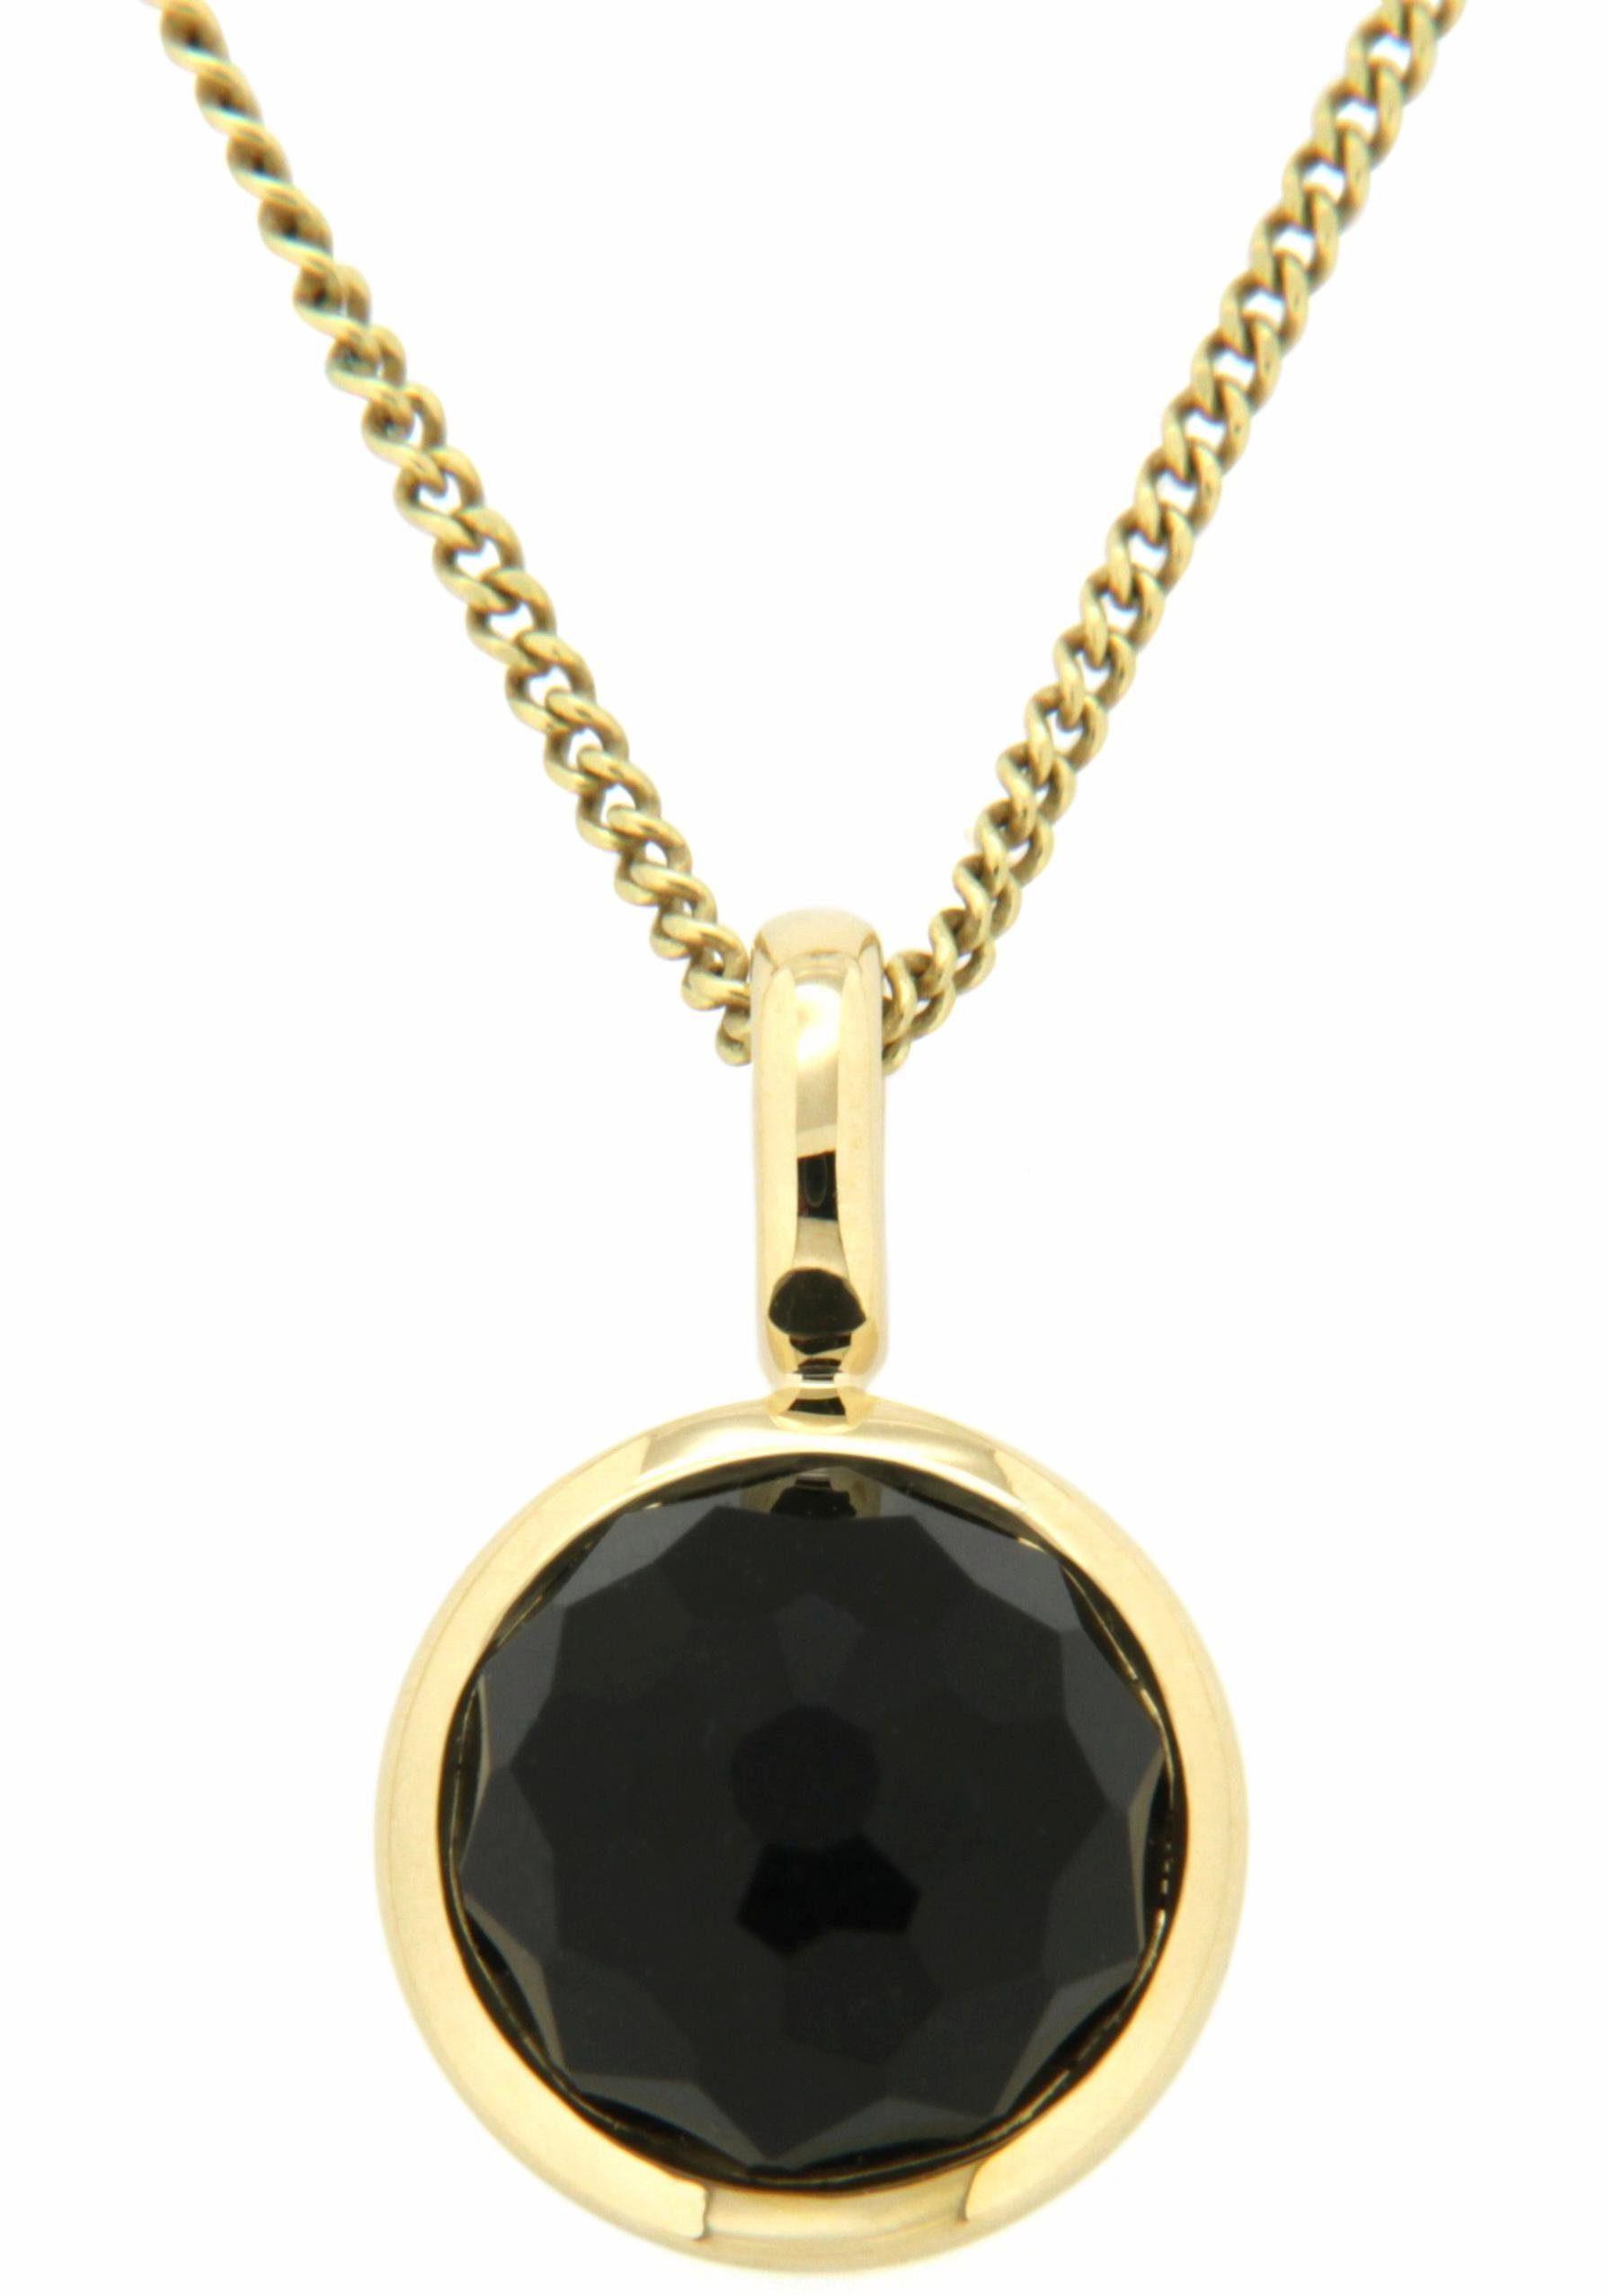 Vivance jewels Kettenanhänger mit Onyx